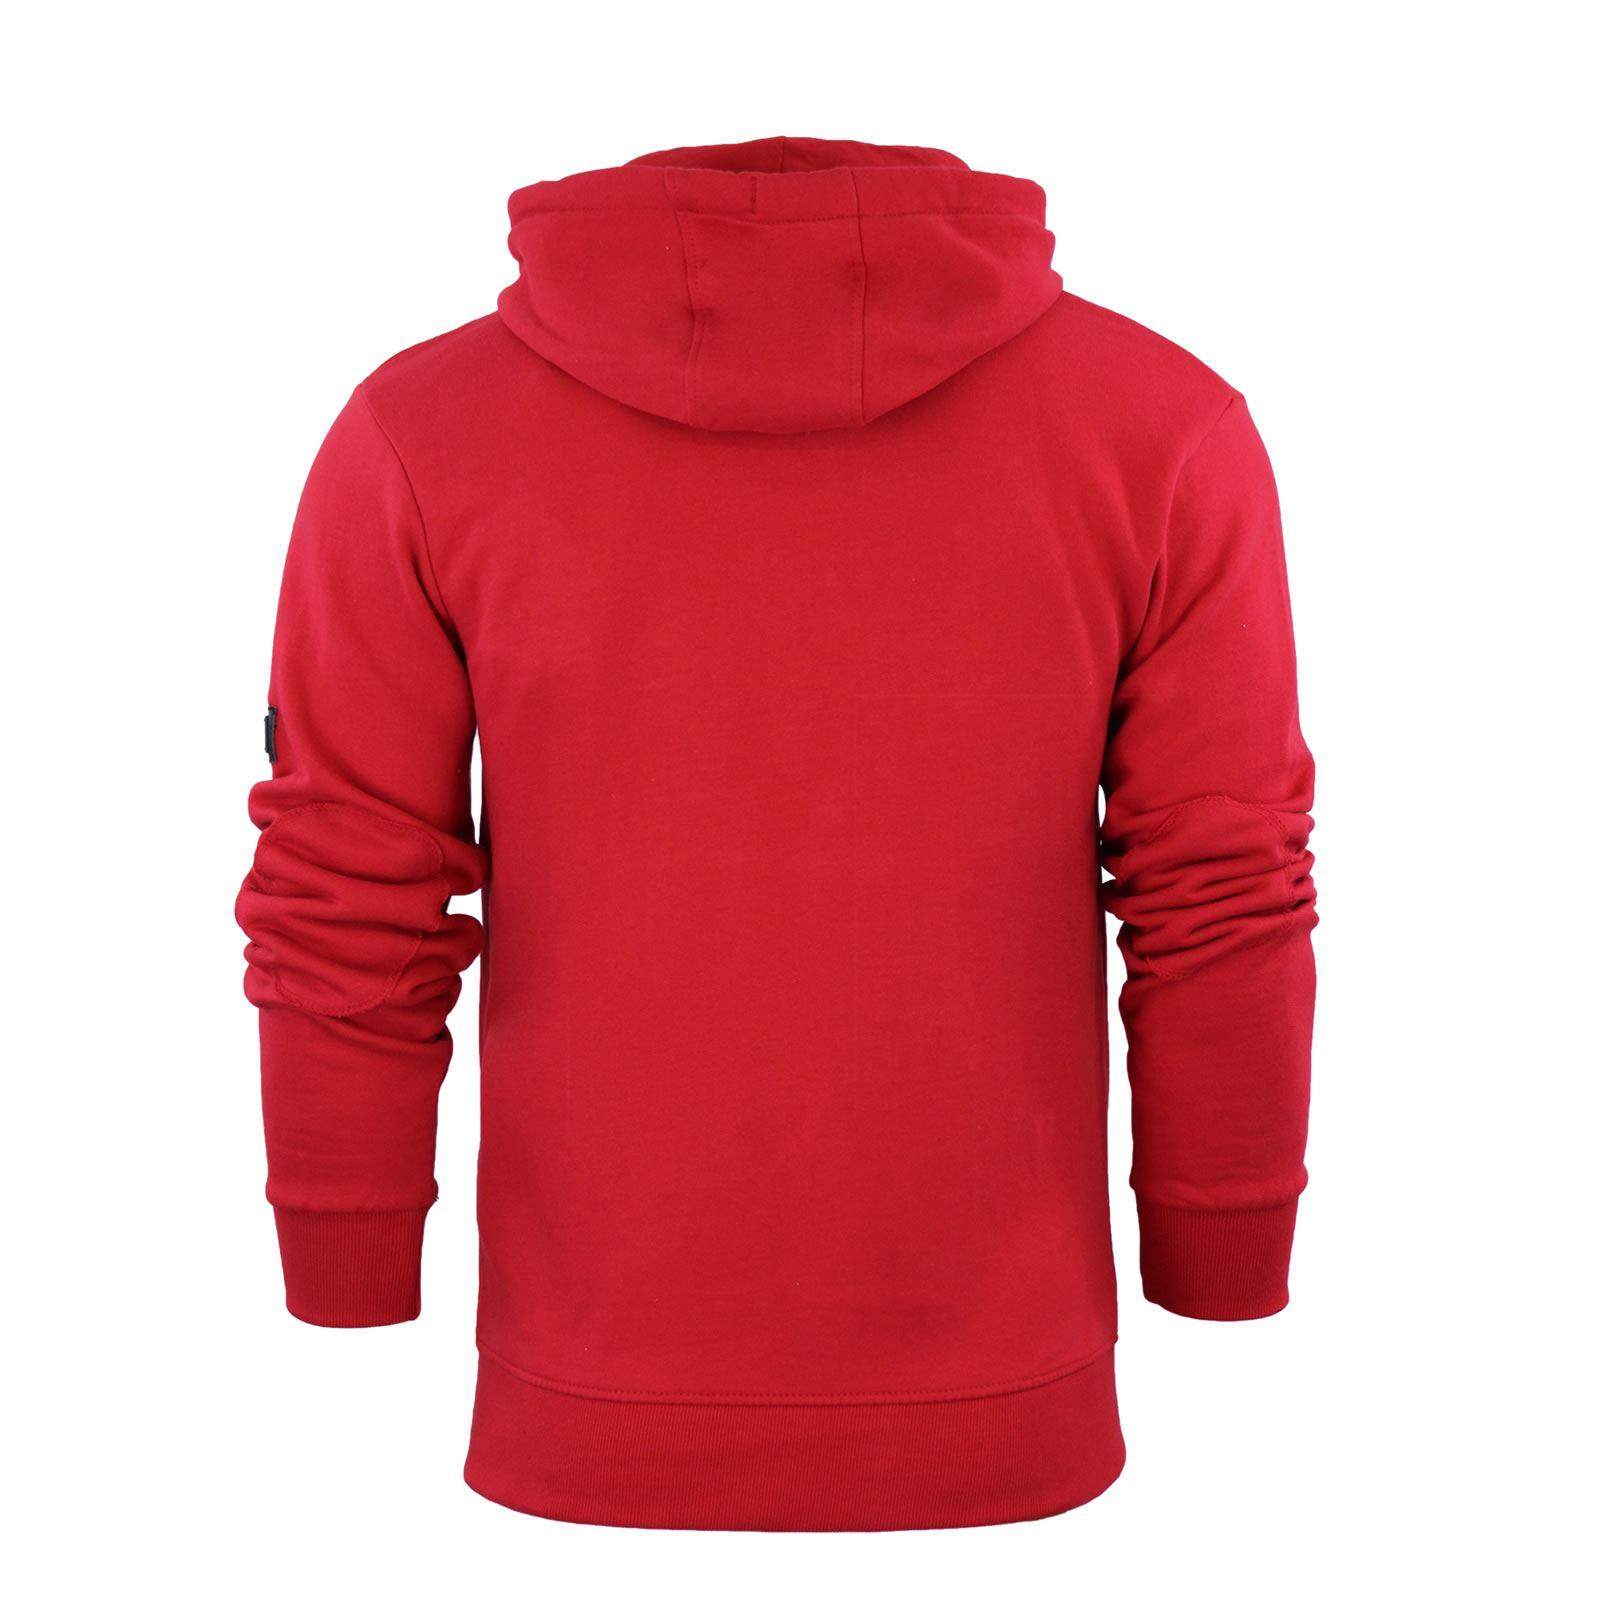 Mens-Hoodie-Smith-amp-Jones-Zip-Up-Hooded-Sweater-Jumper thumbnail 21